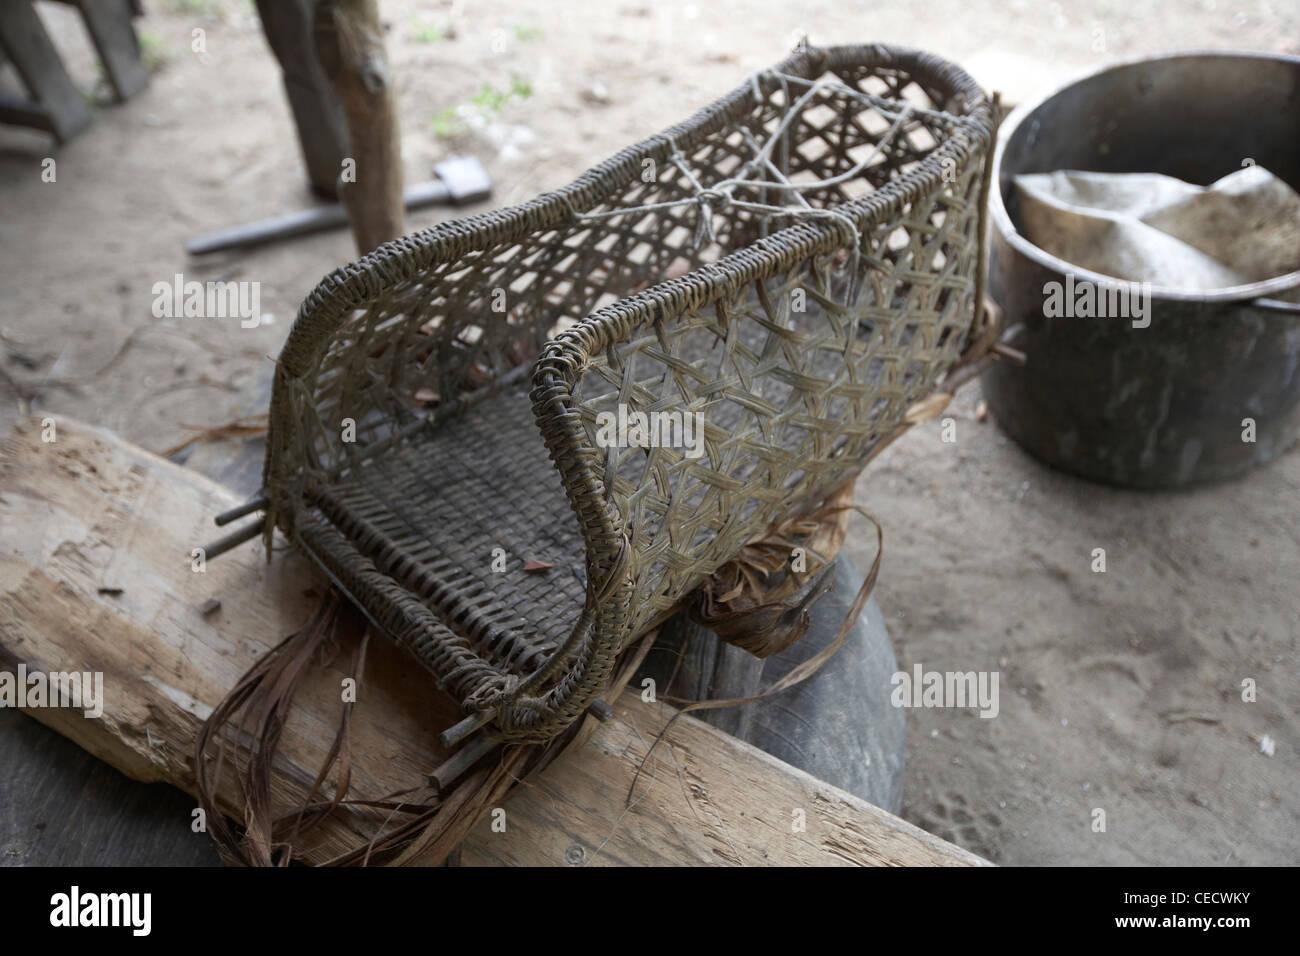 A traditional Amerindian woven carrying basket, Rewa, Rupununi, Guyana, South America - Stock Image